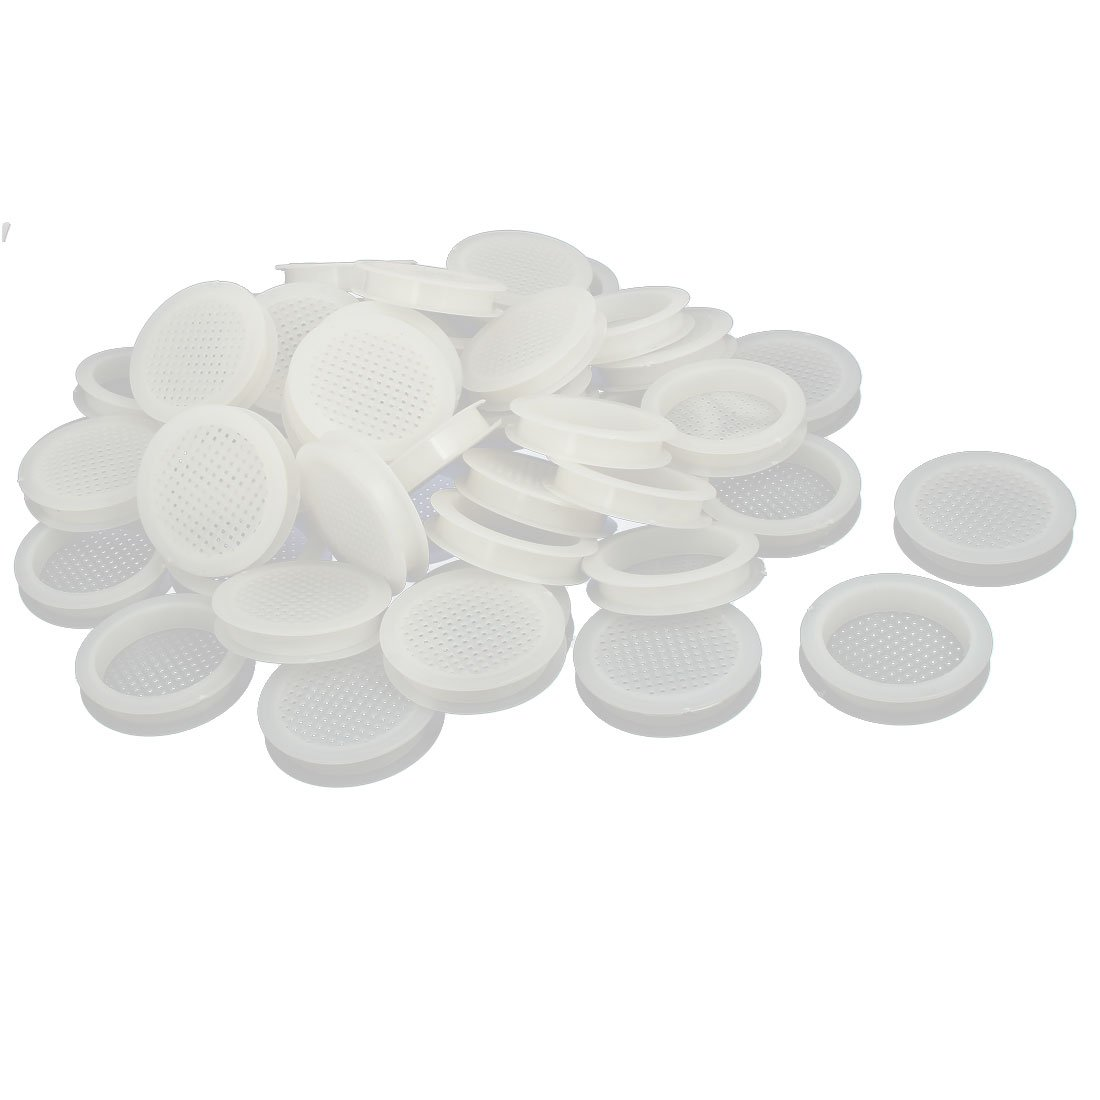 uxcell Shoes Cabinet 10mm Plastic Square Mesh Hole Air Vent Louver Cover White 100pcs